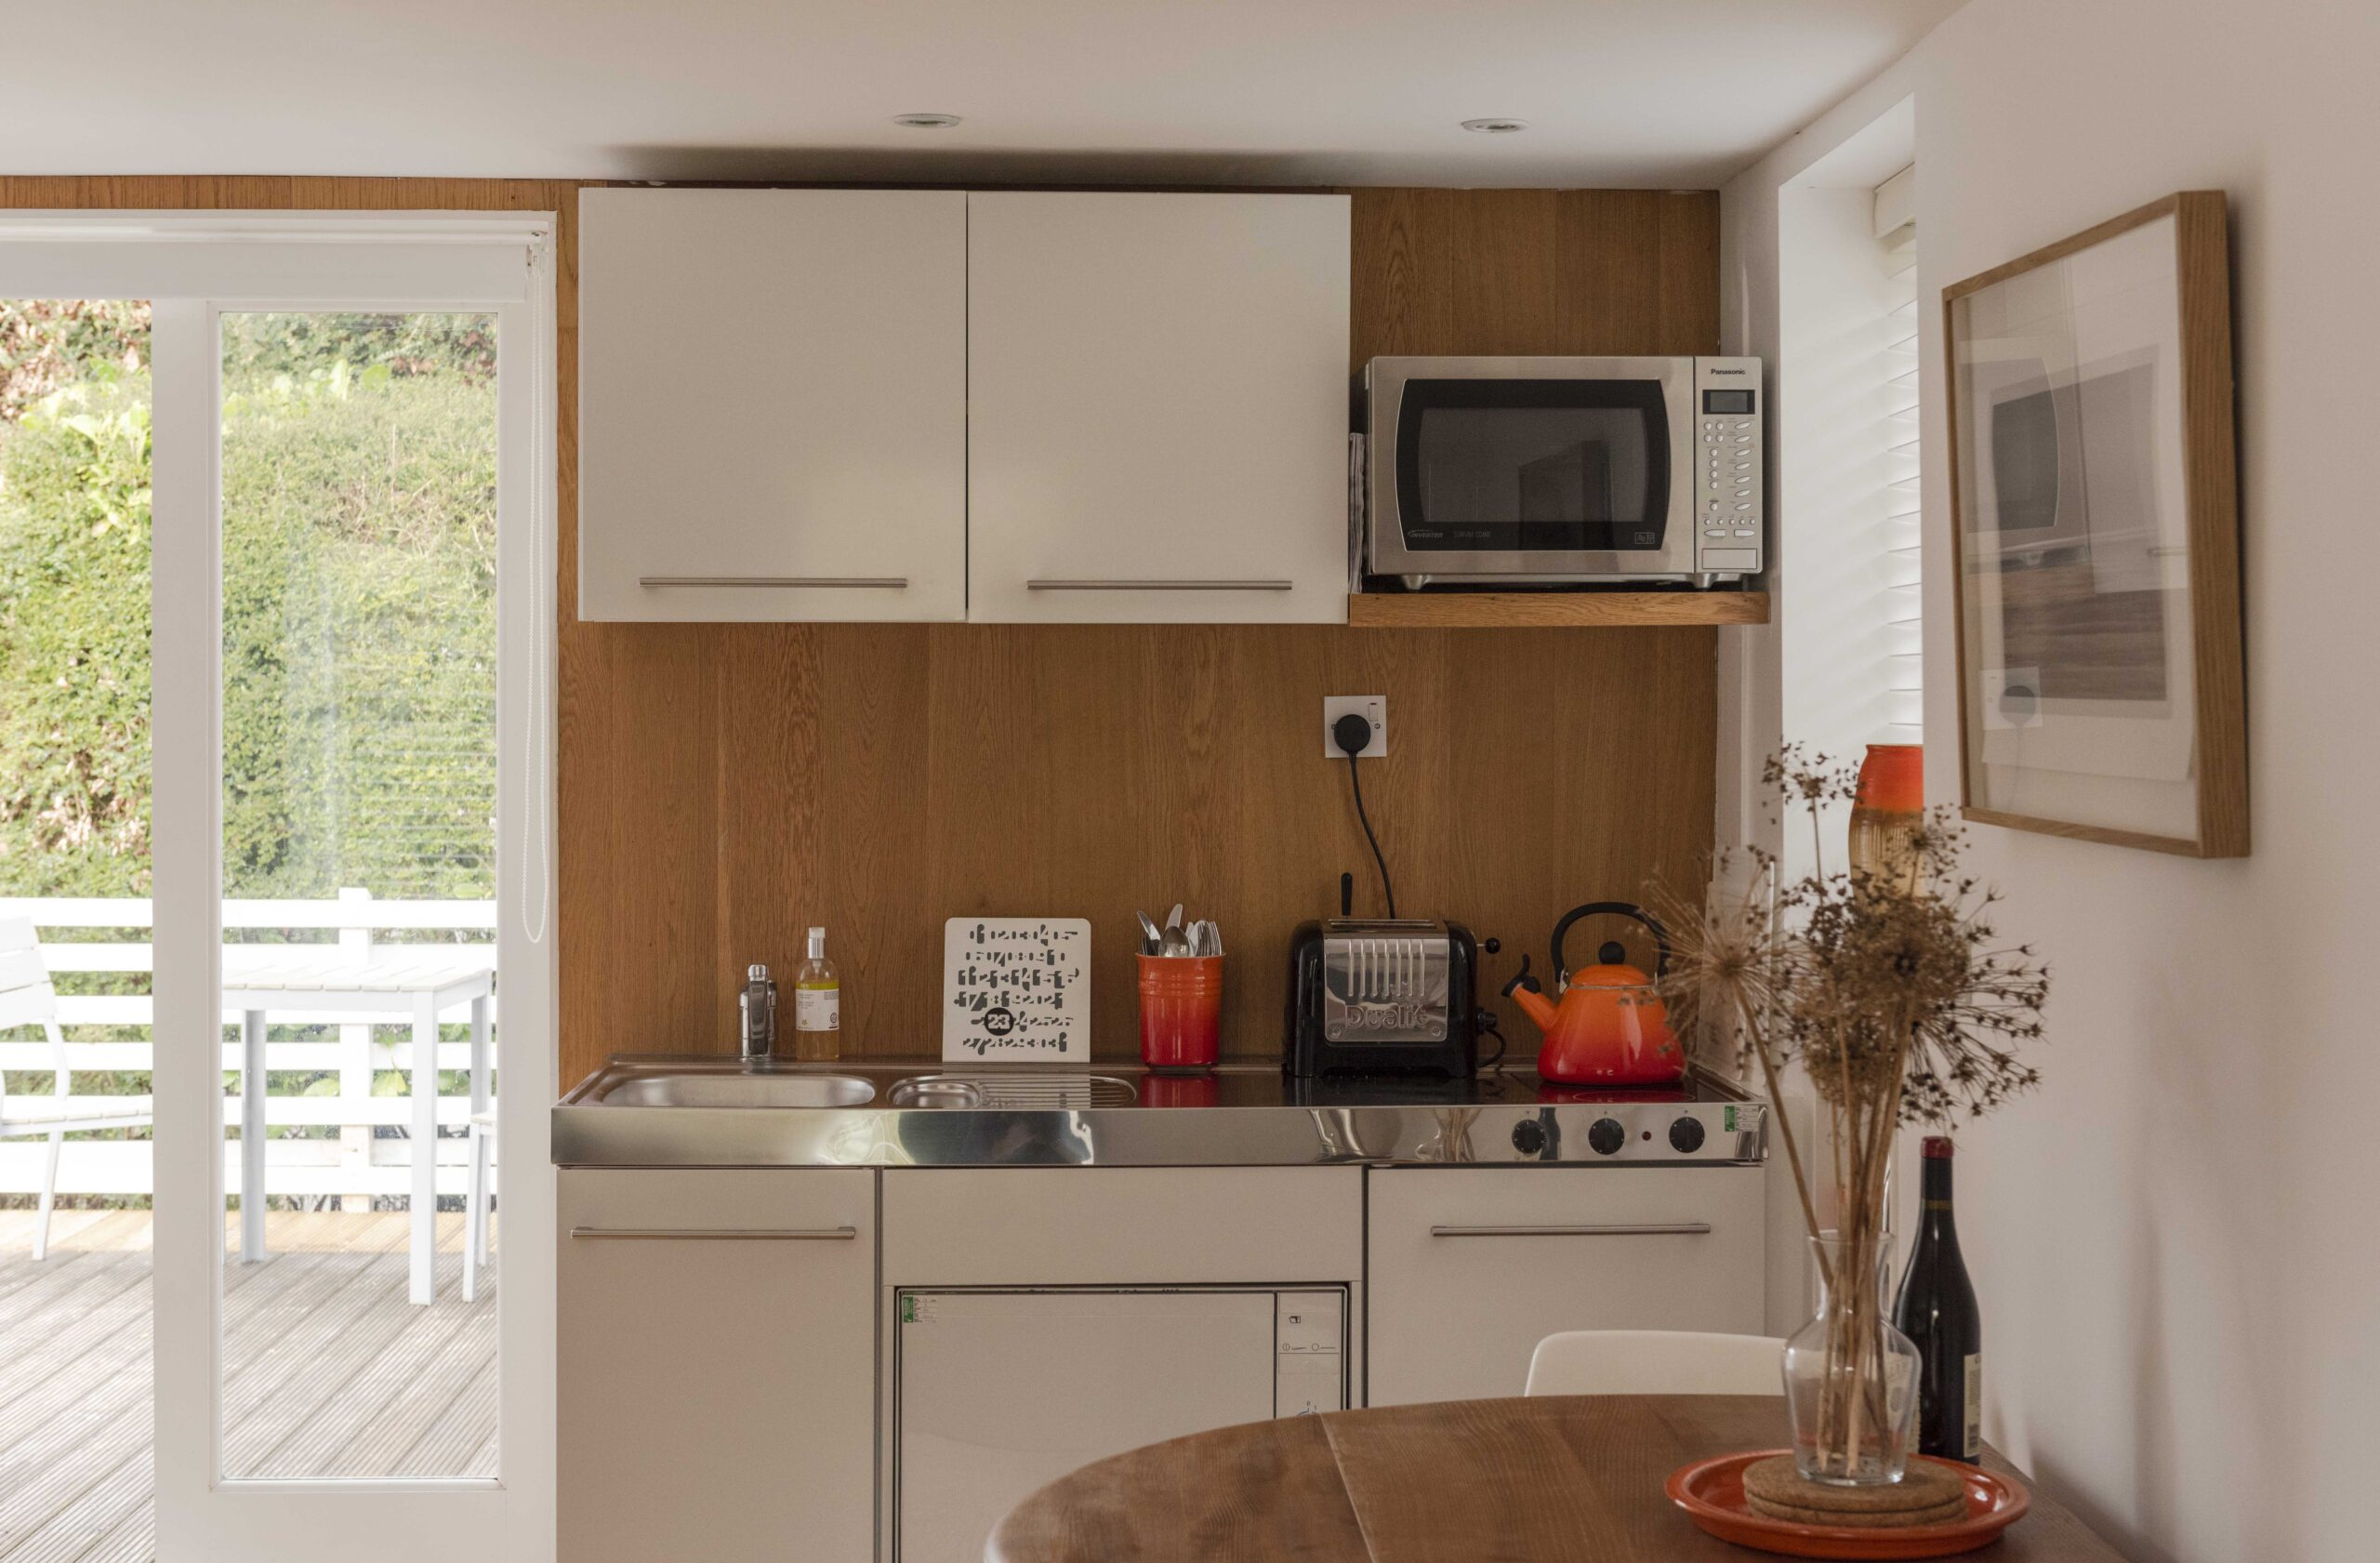 Lyme Regis Hideaway - kitchen area